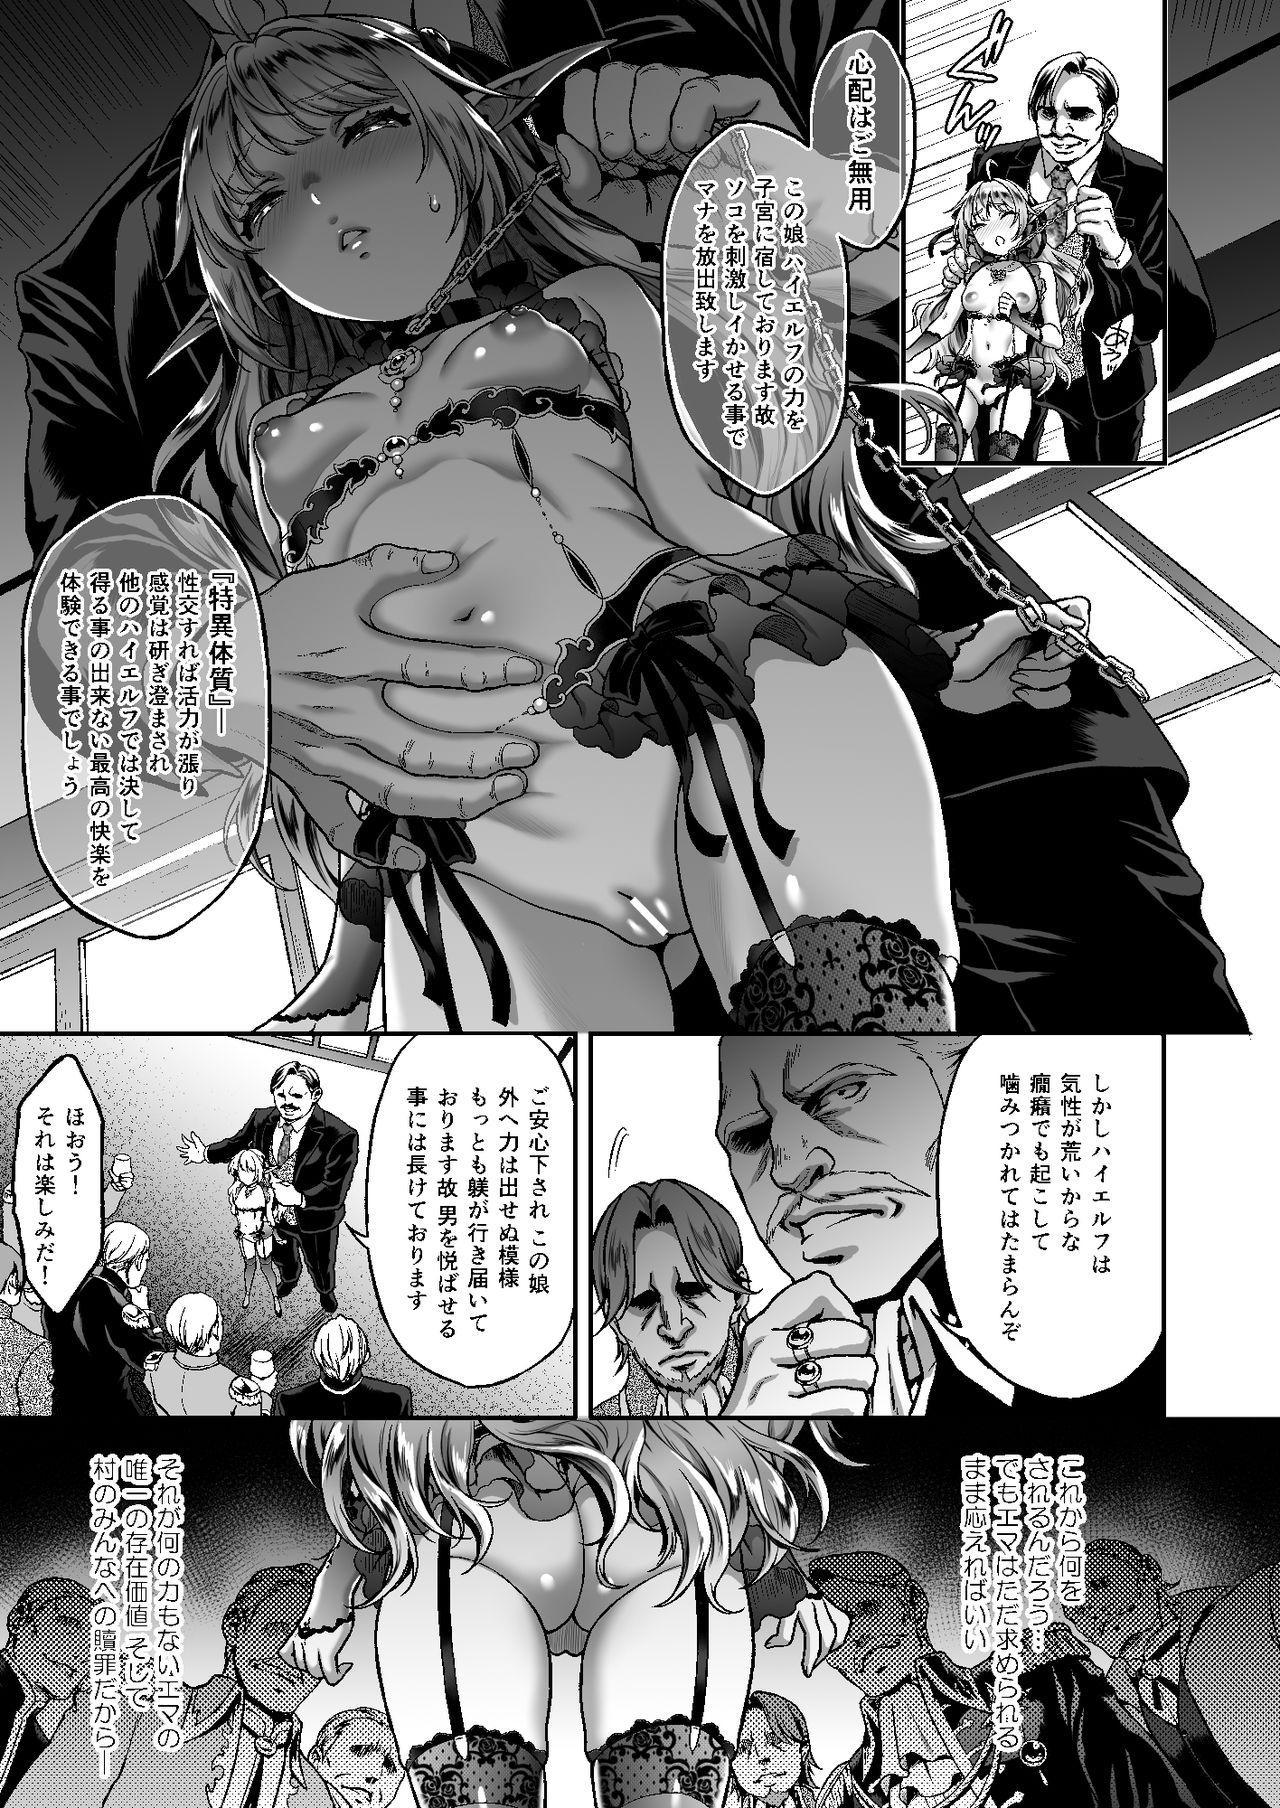 Tasogare no Shou Elf 6 - The story of Emma's side 4